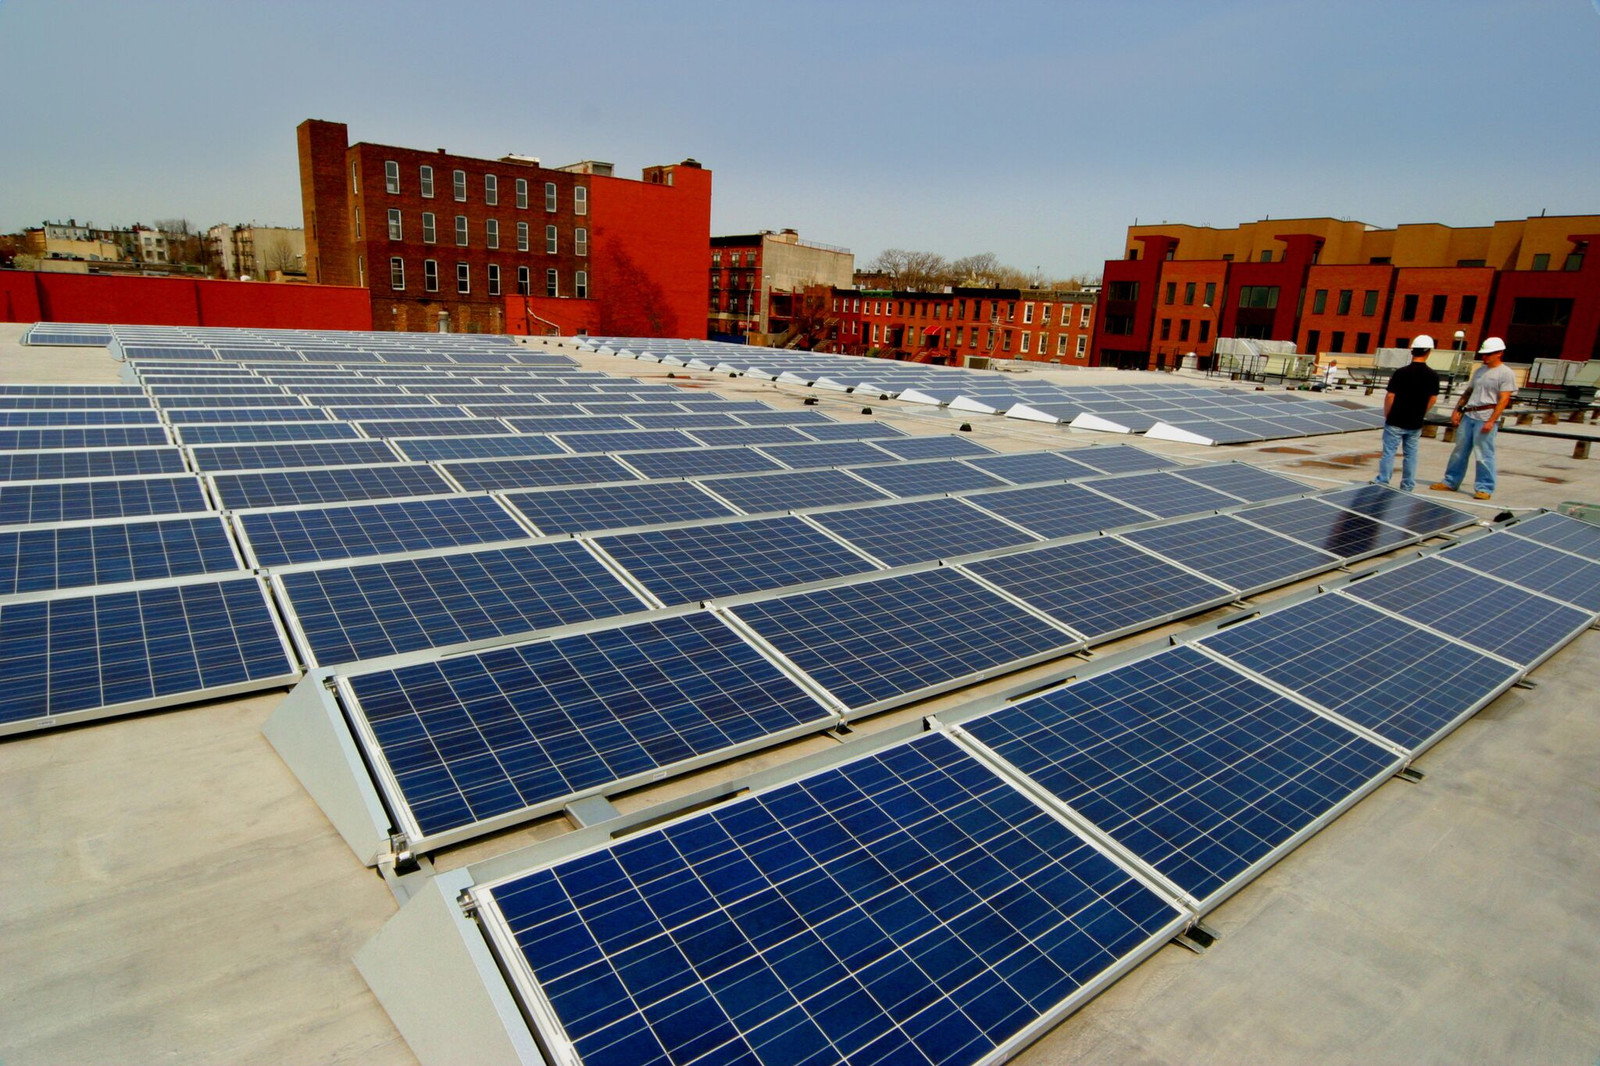 nyc solar installer quixotic systems designs vertical - HD1600×1067